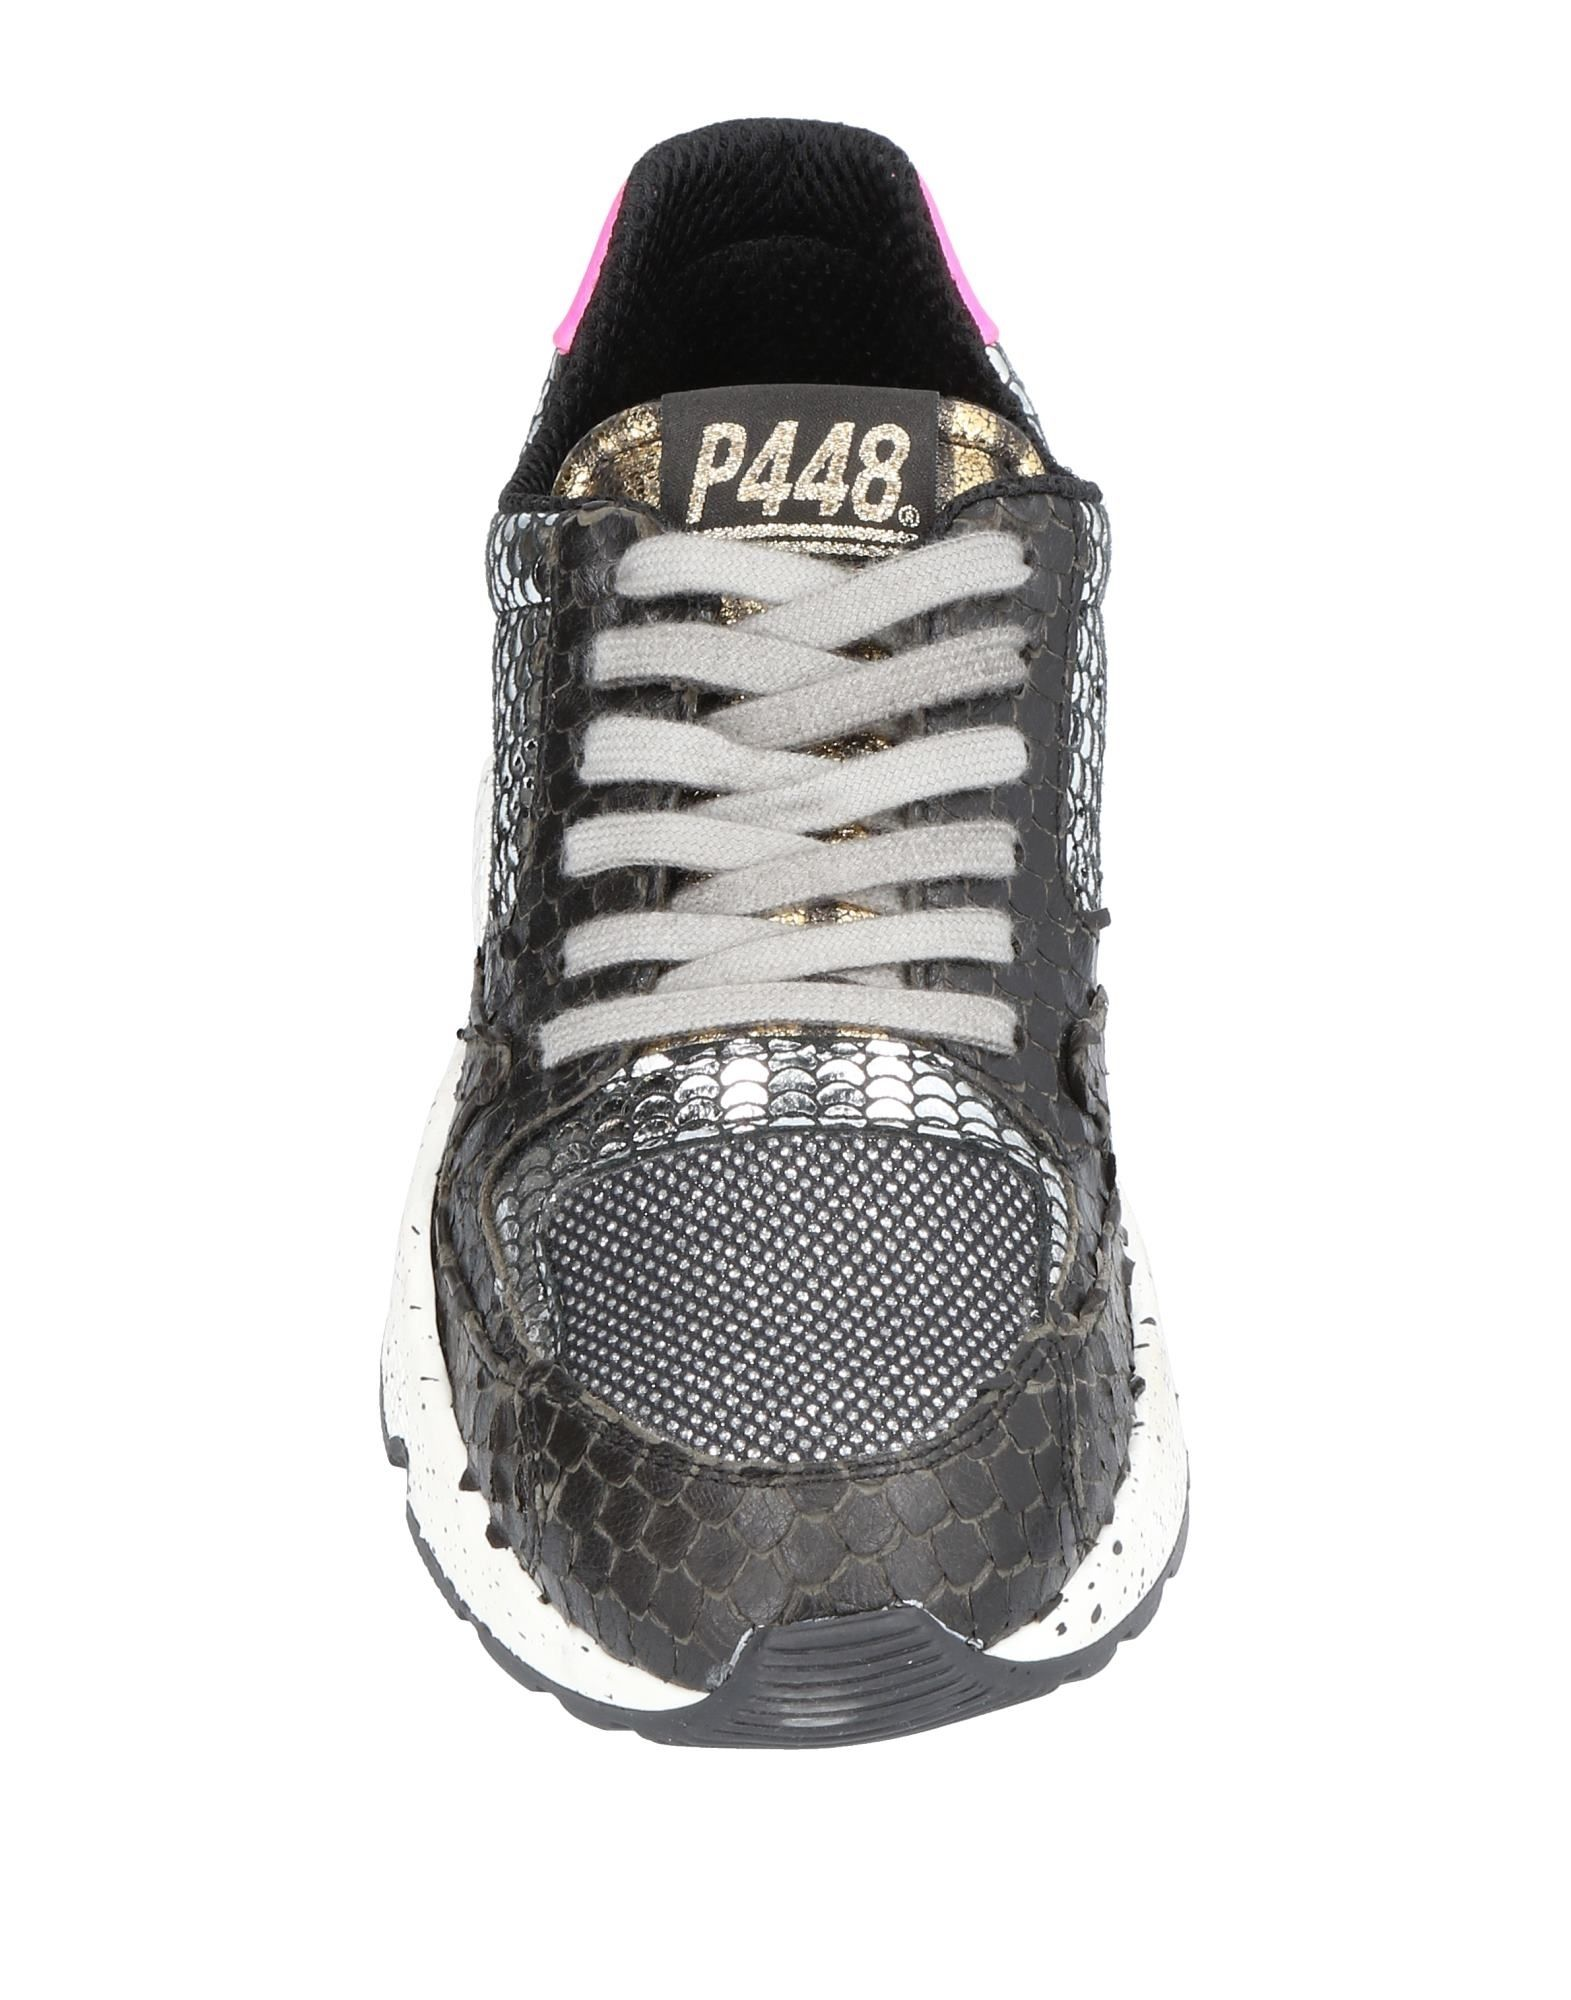 Moda Sneakers P448 Donna - - - 11456886XP 2cd917